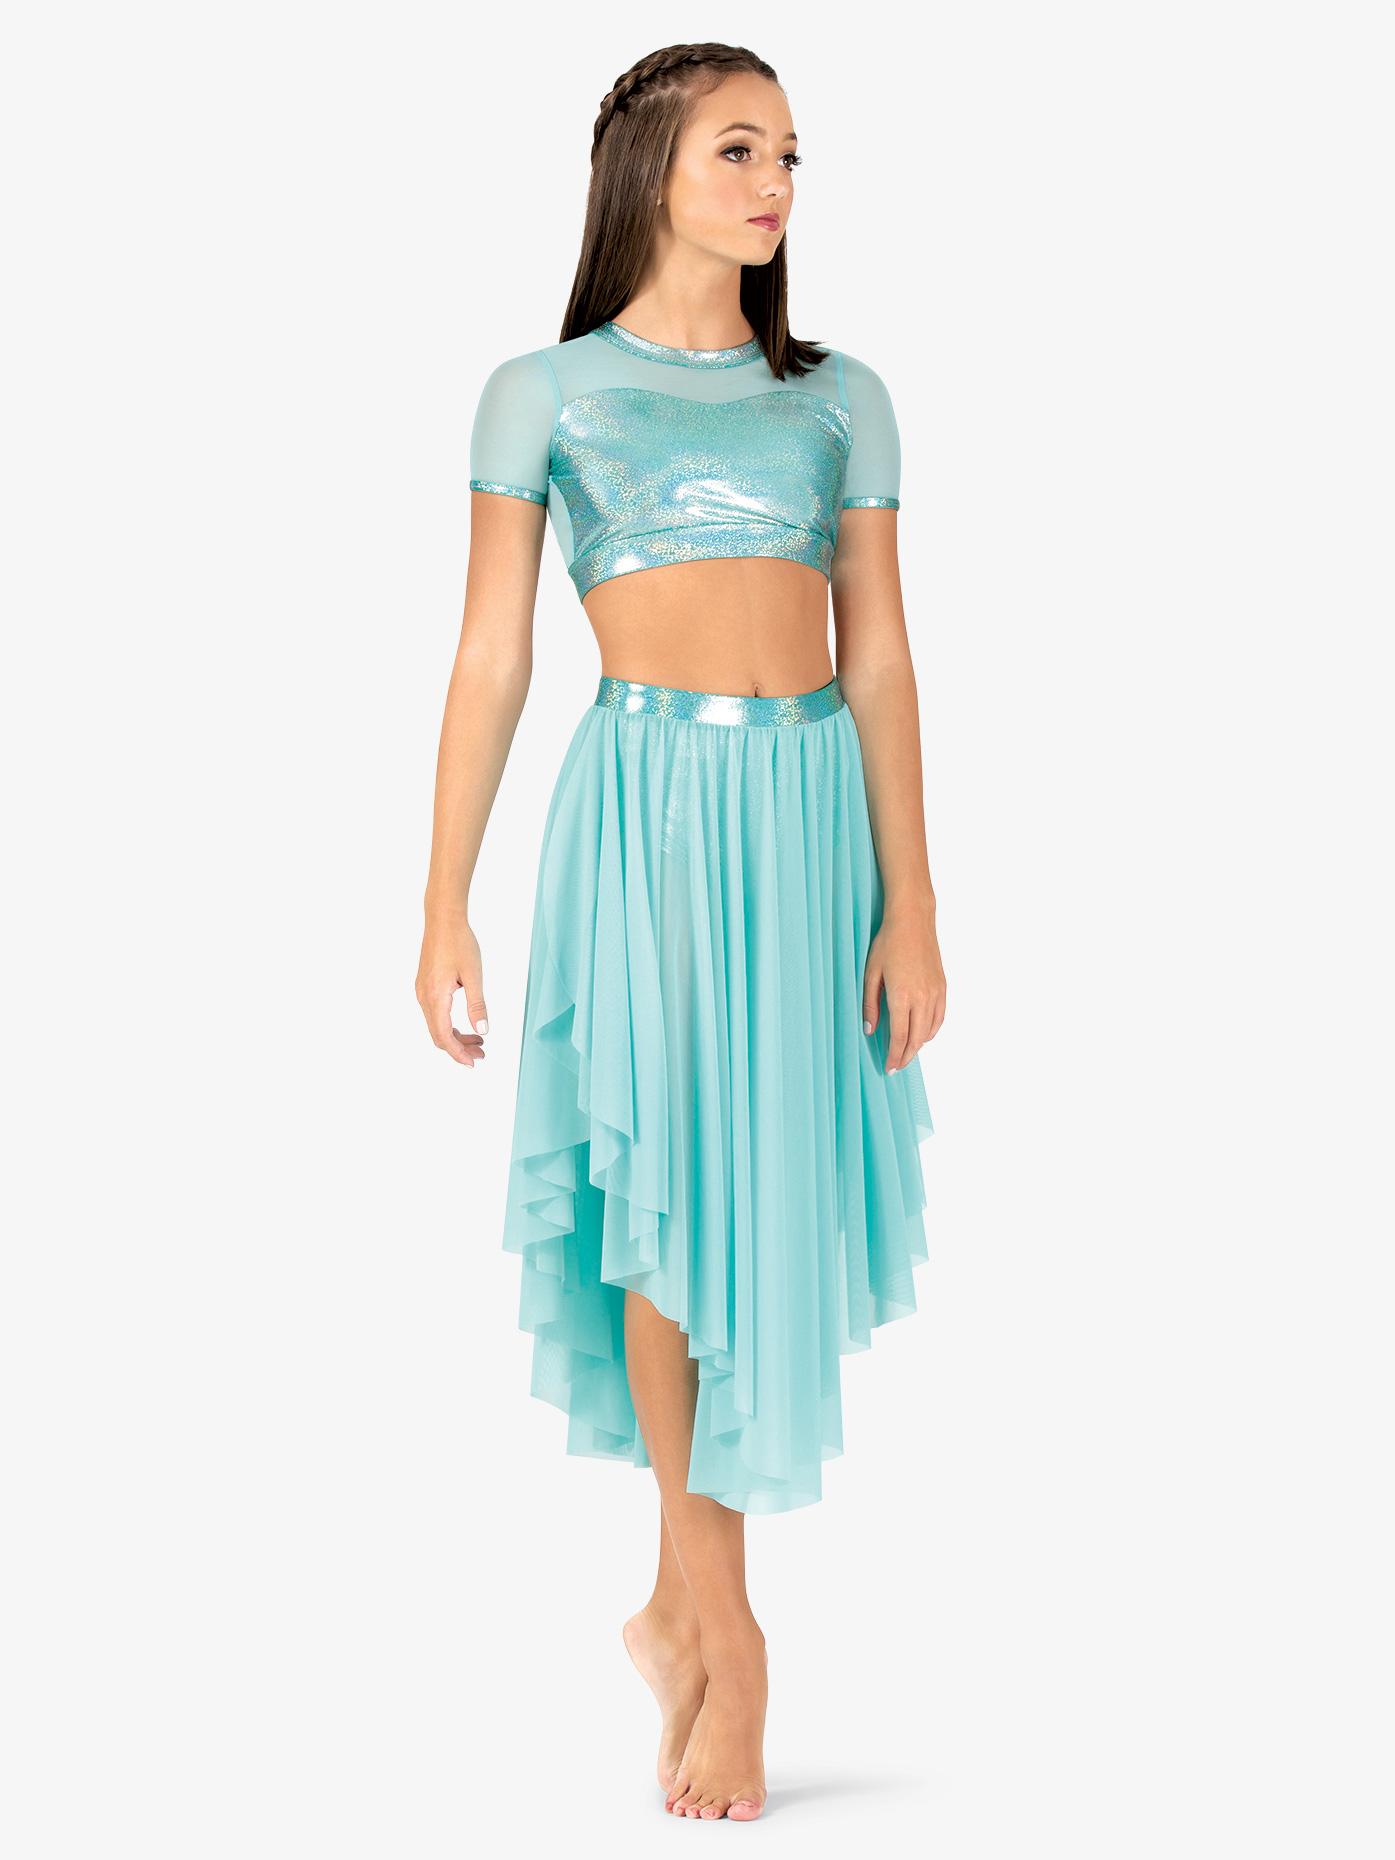 Ingenue Womens Iridescent Waistband Performance Asymmetrical Skirt ING149